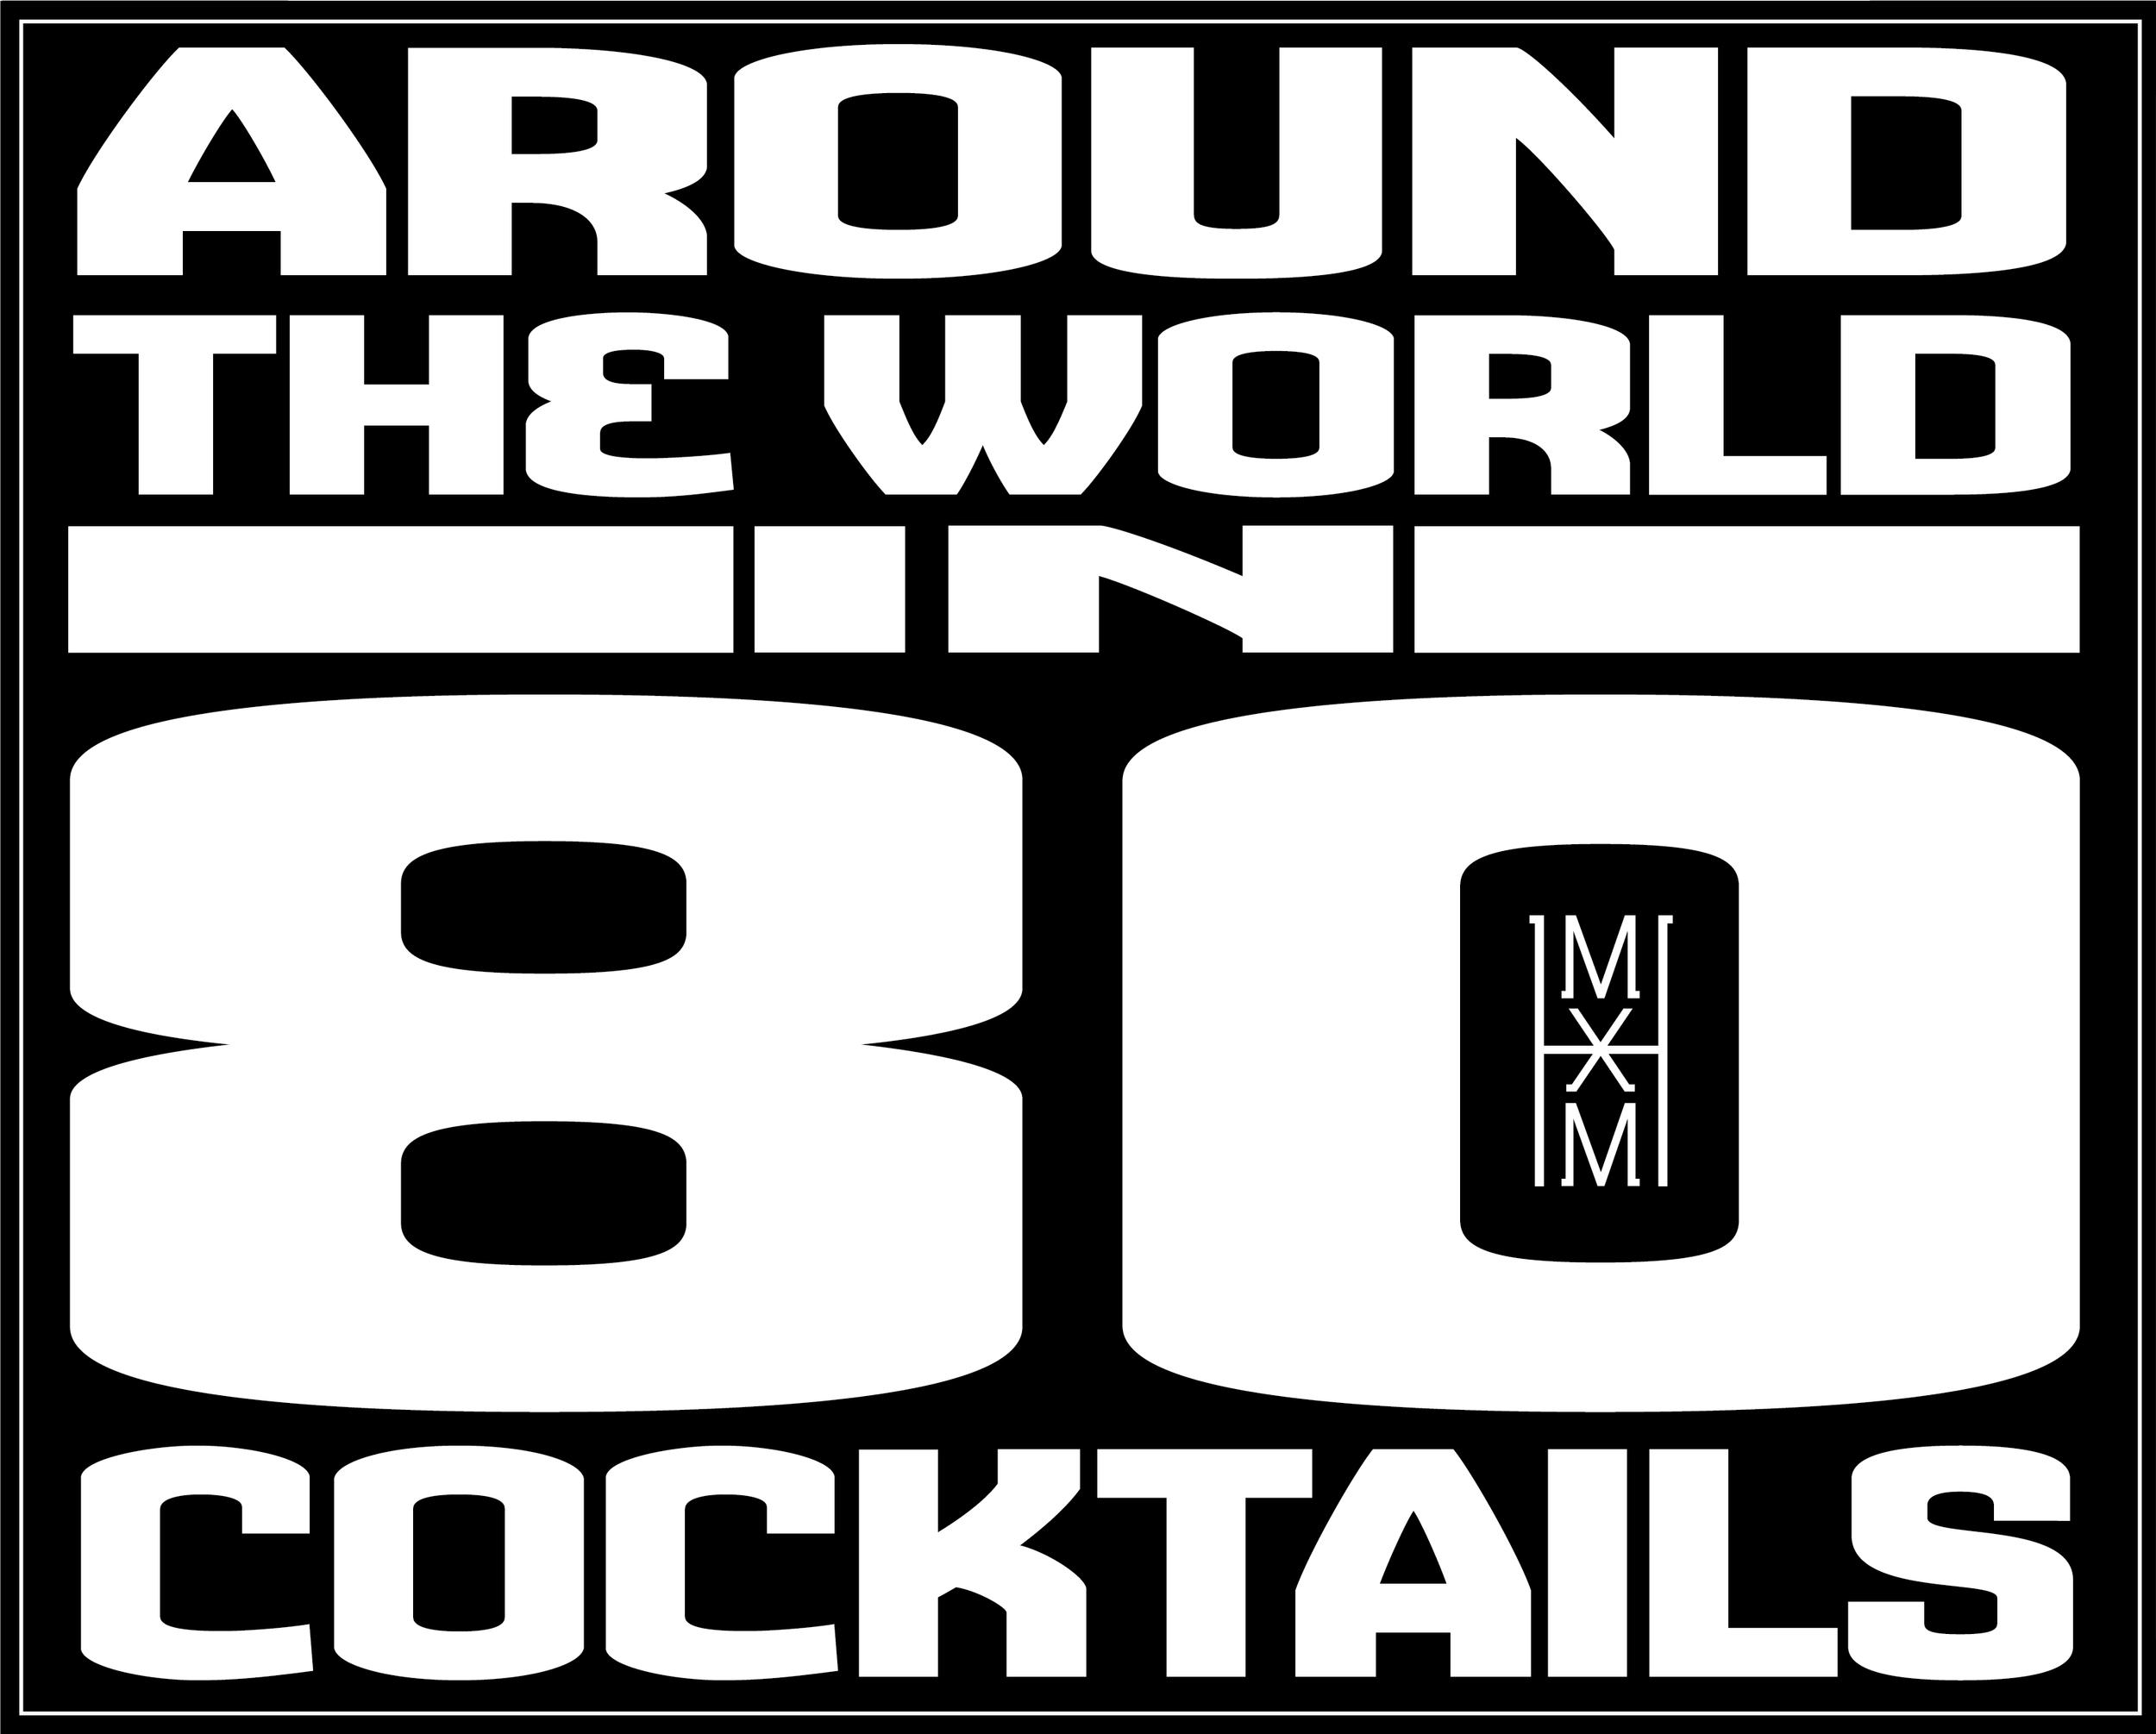 AROUND THE WORLD BLACK-05.png